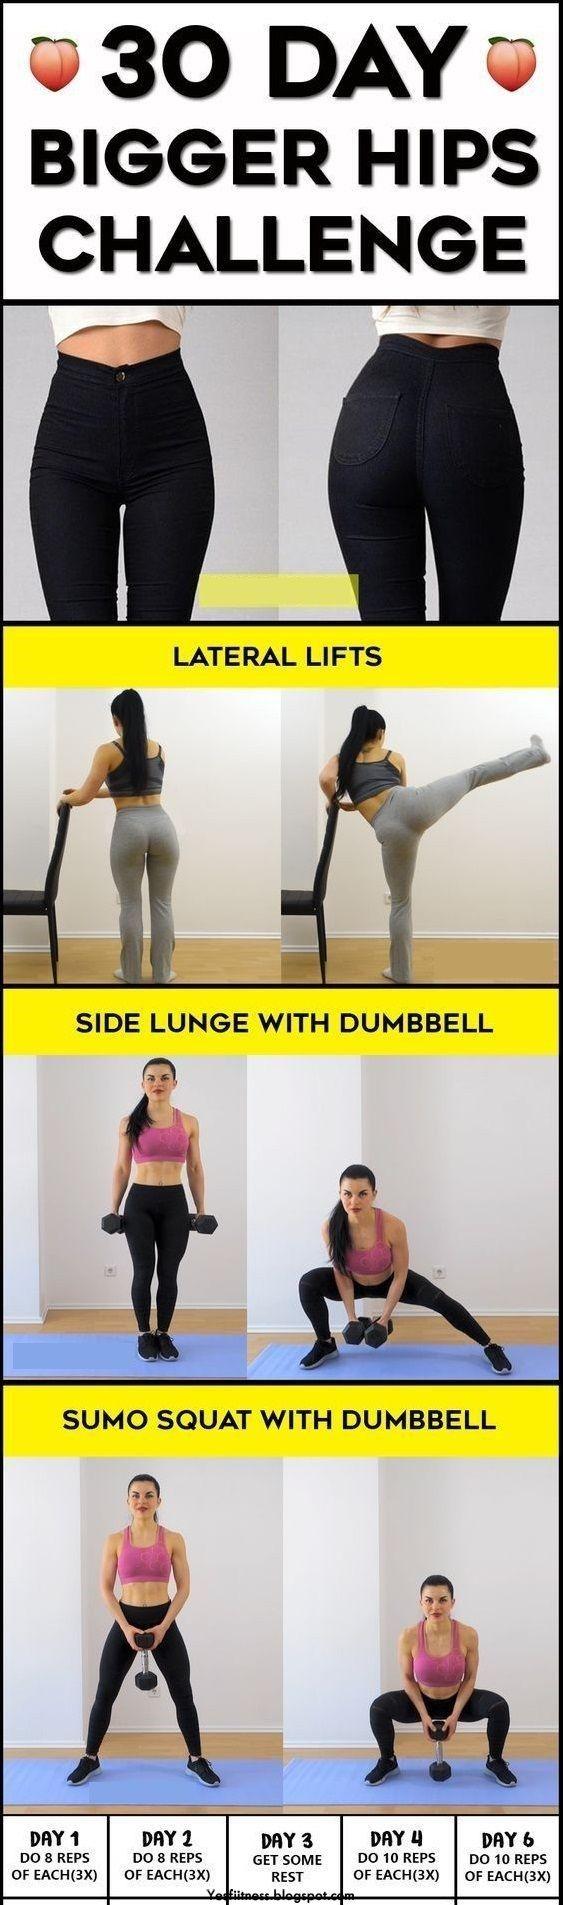 24 best Get A Bigger Hips images on Pinterest | Butt ...